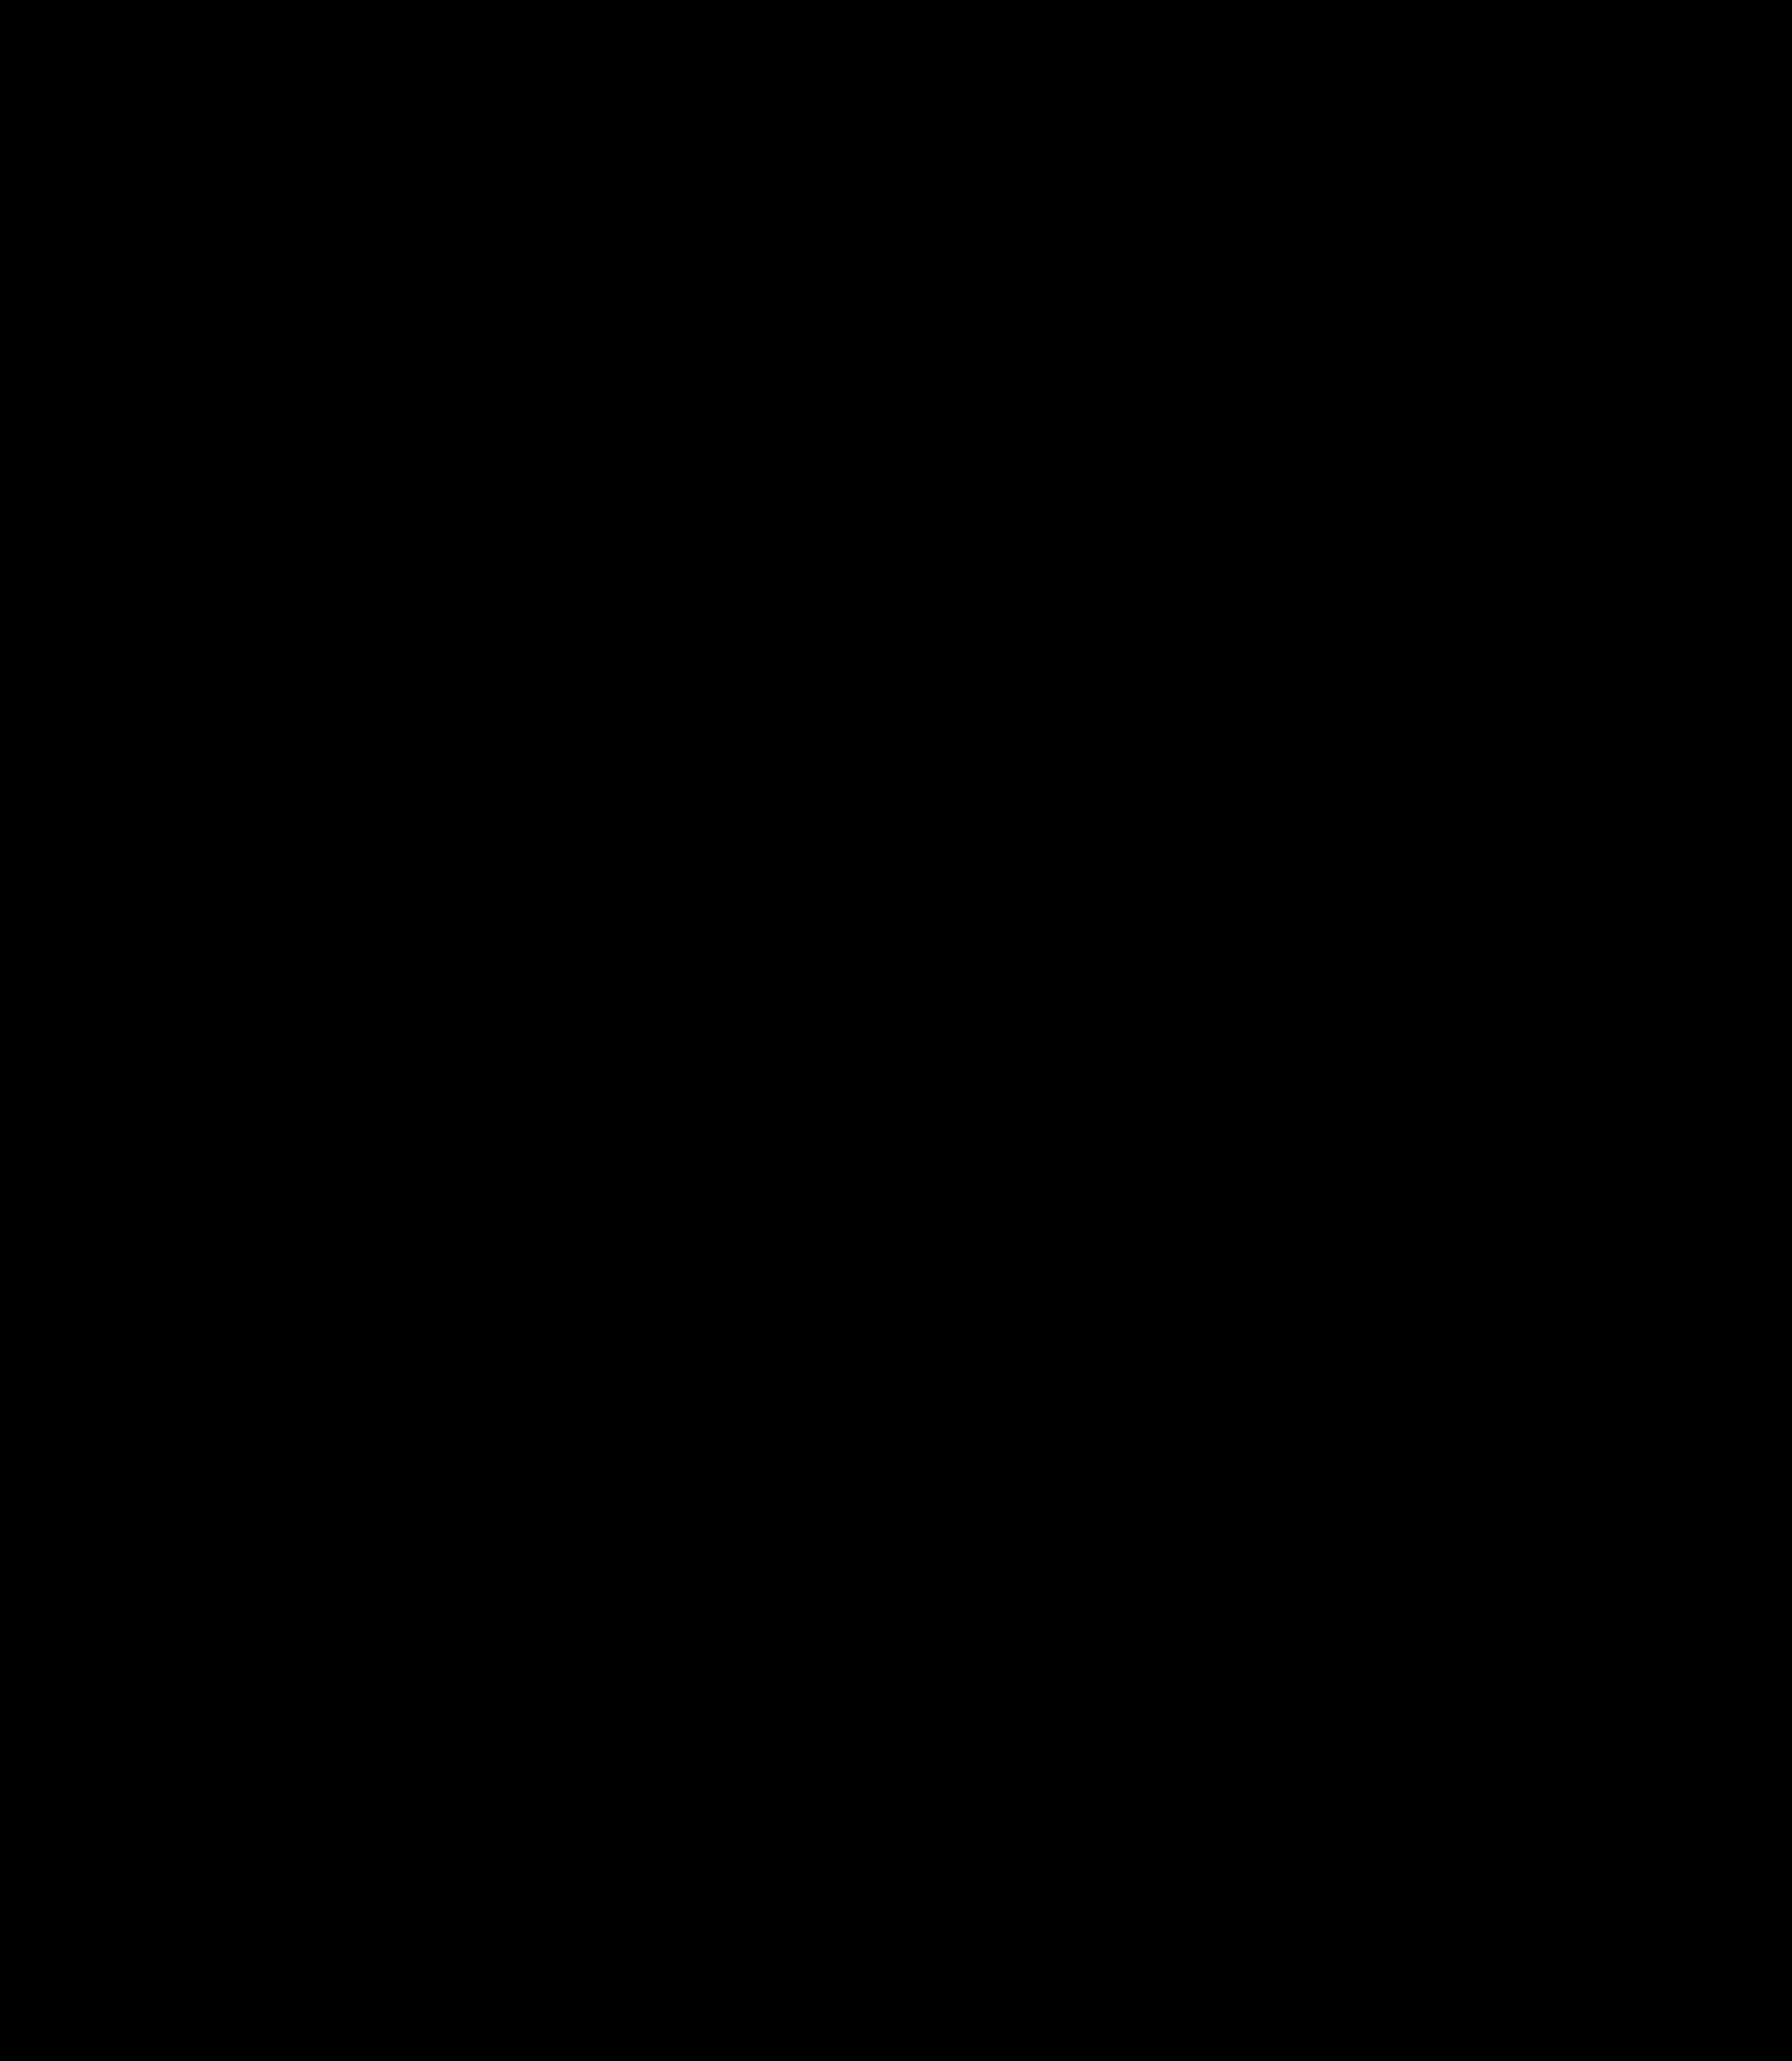 The walt disney logos download the walt disney biocorpaavc Choice Image